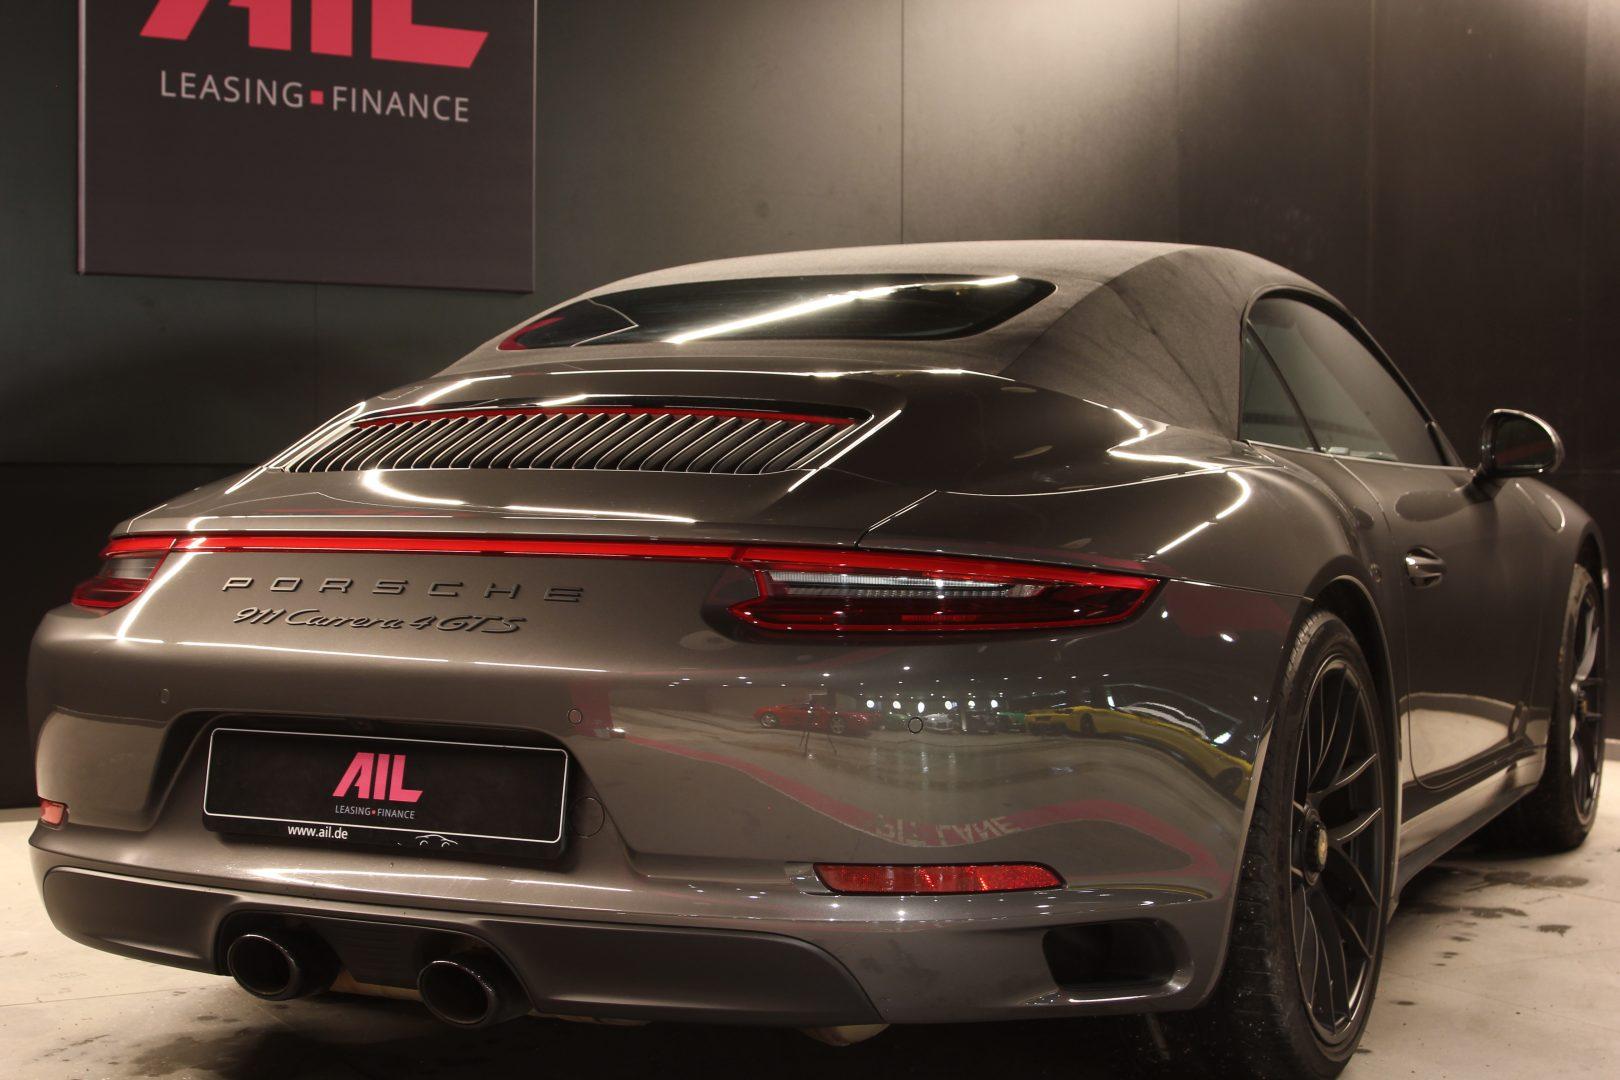 AIL Porsche 991 4 GTS LED BOSE 7